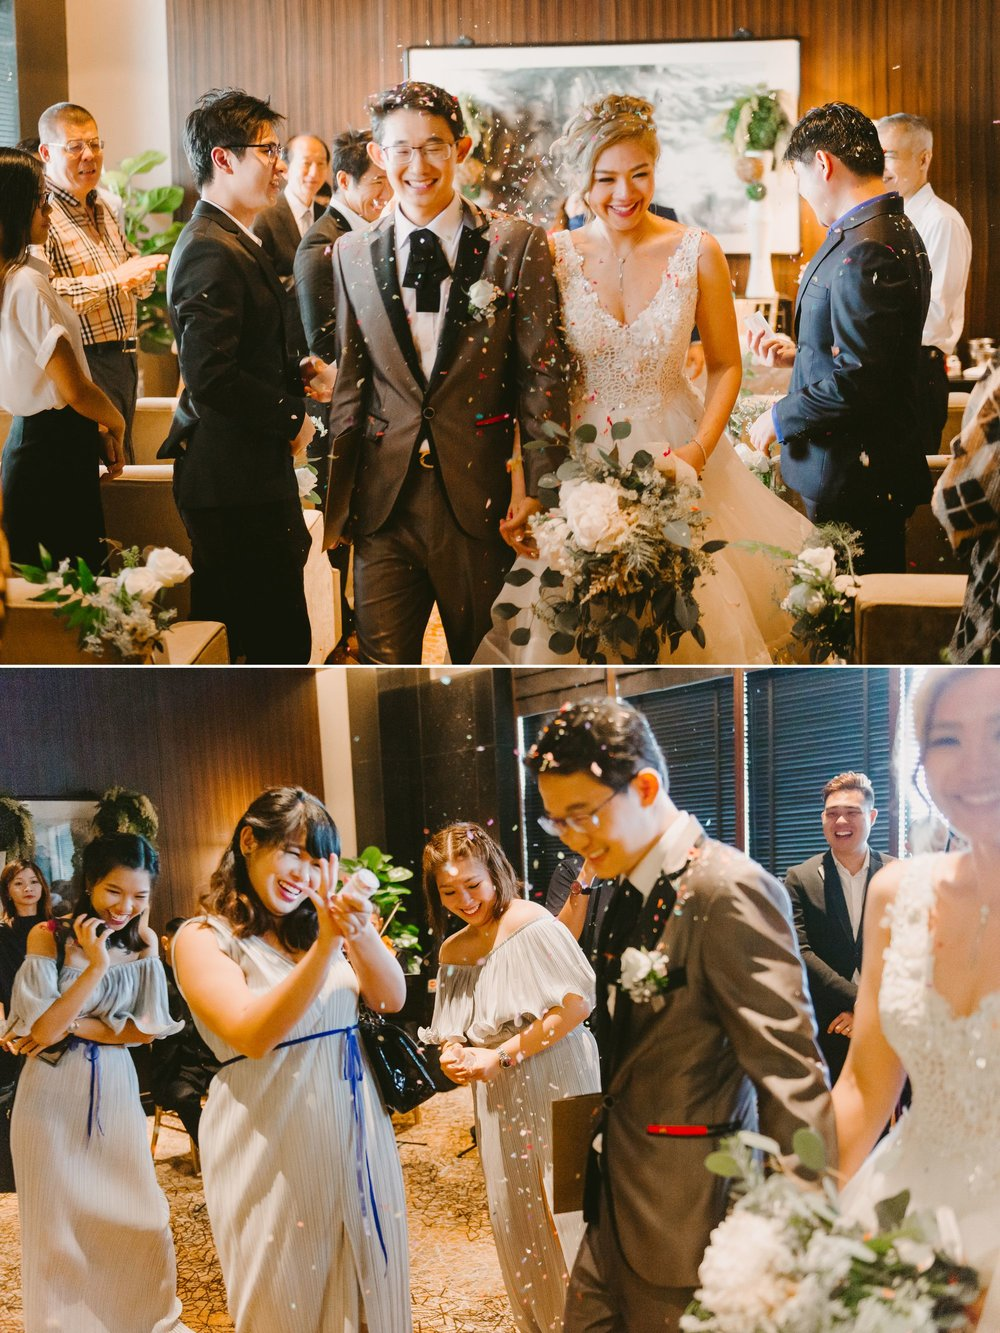 wedding_photographer_singapore 27.jpg